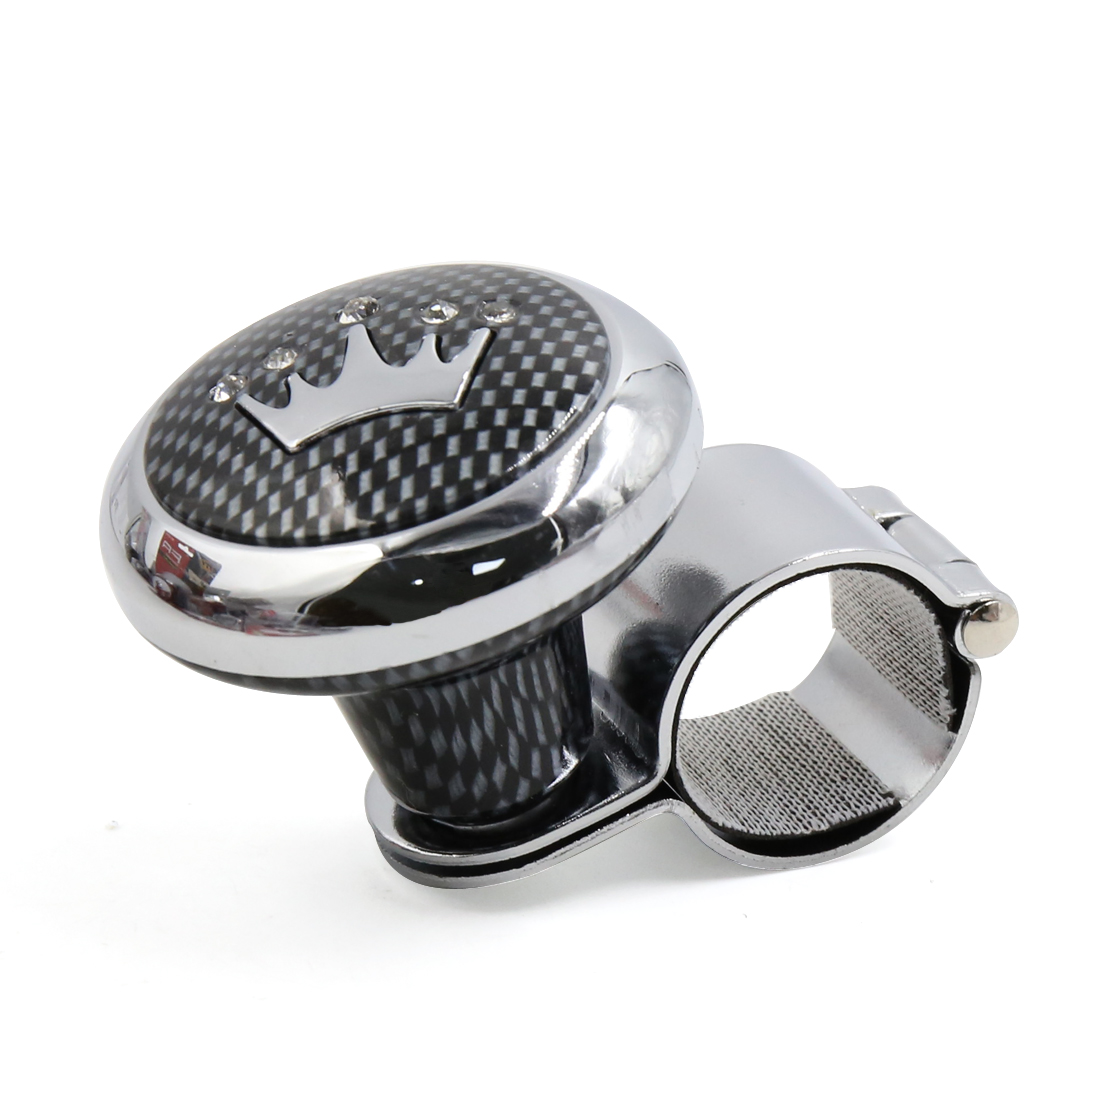 Unique BargainsCarbon Fiber Crown Pattern Design Car Steering Wheel Spinner Knob Power Handle